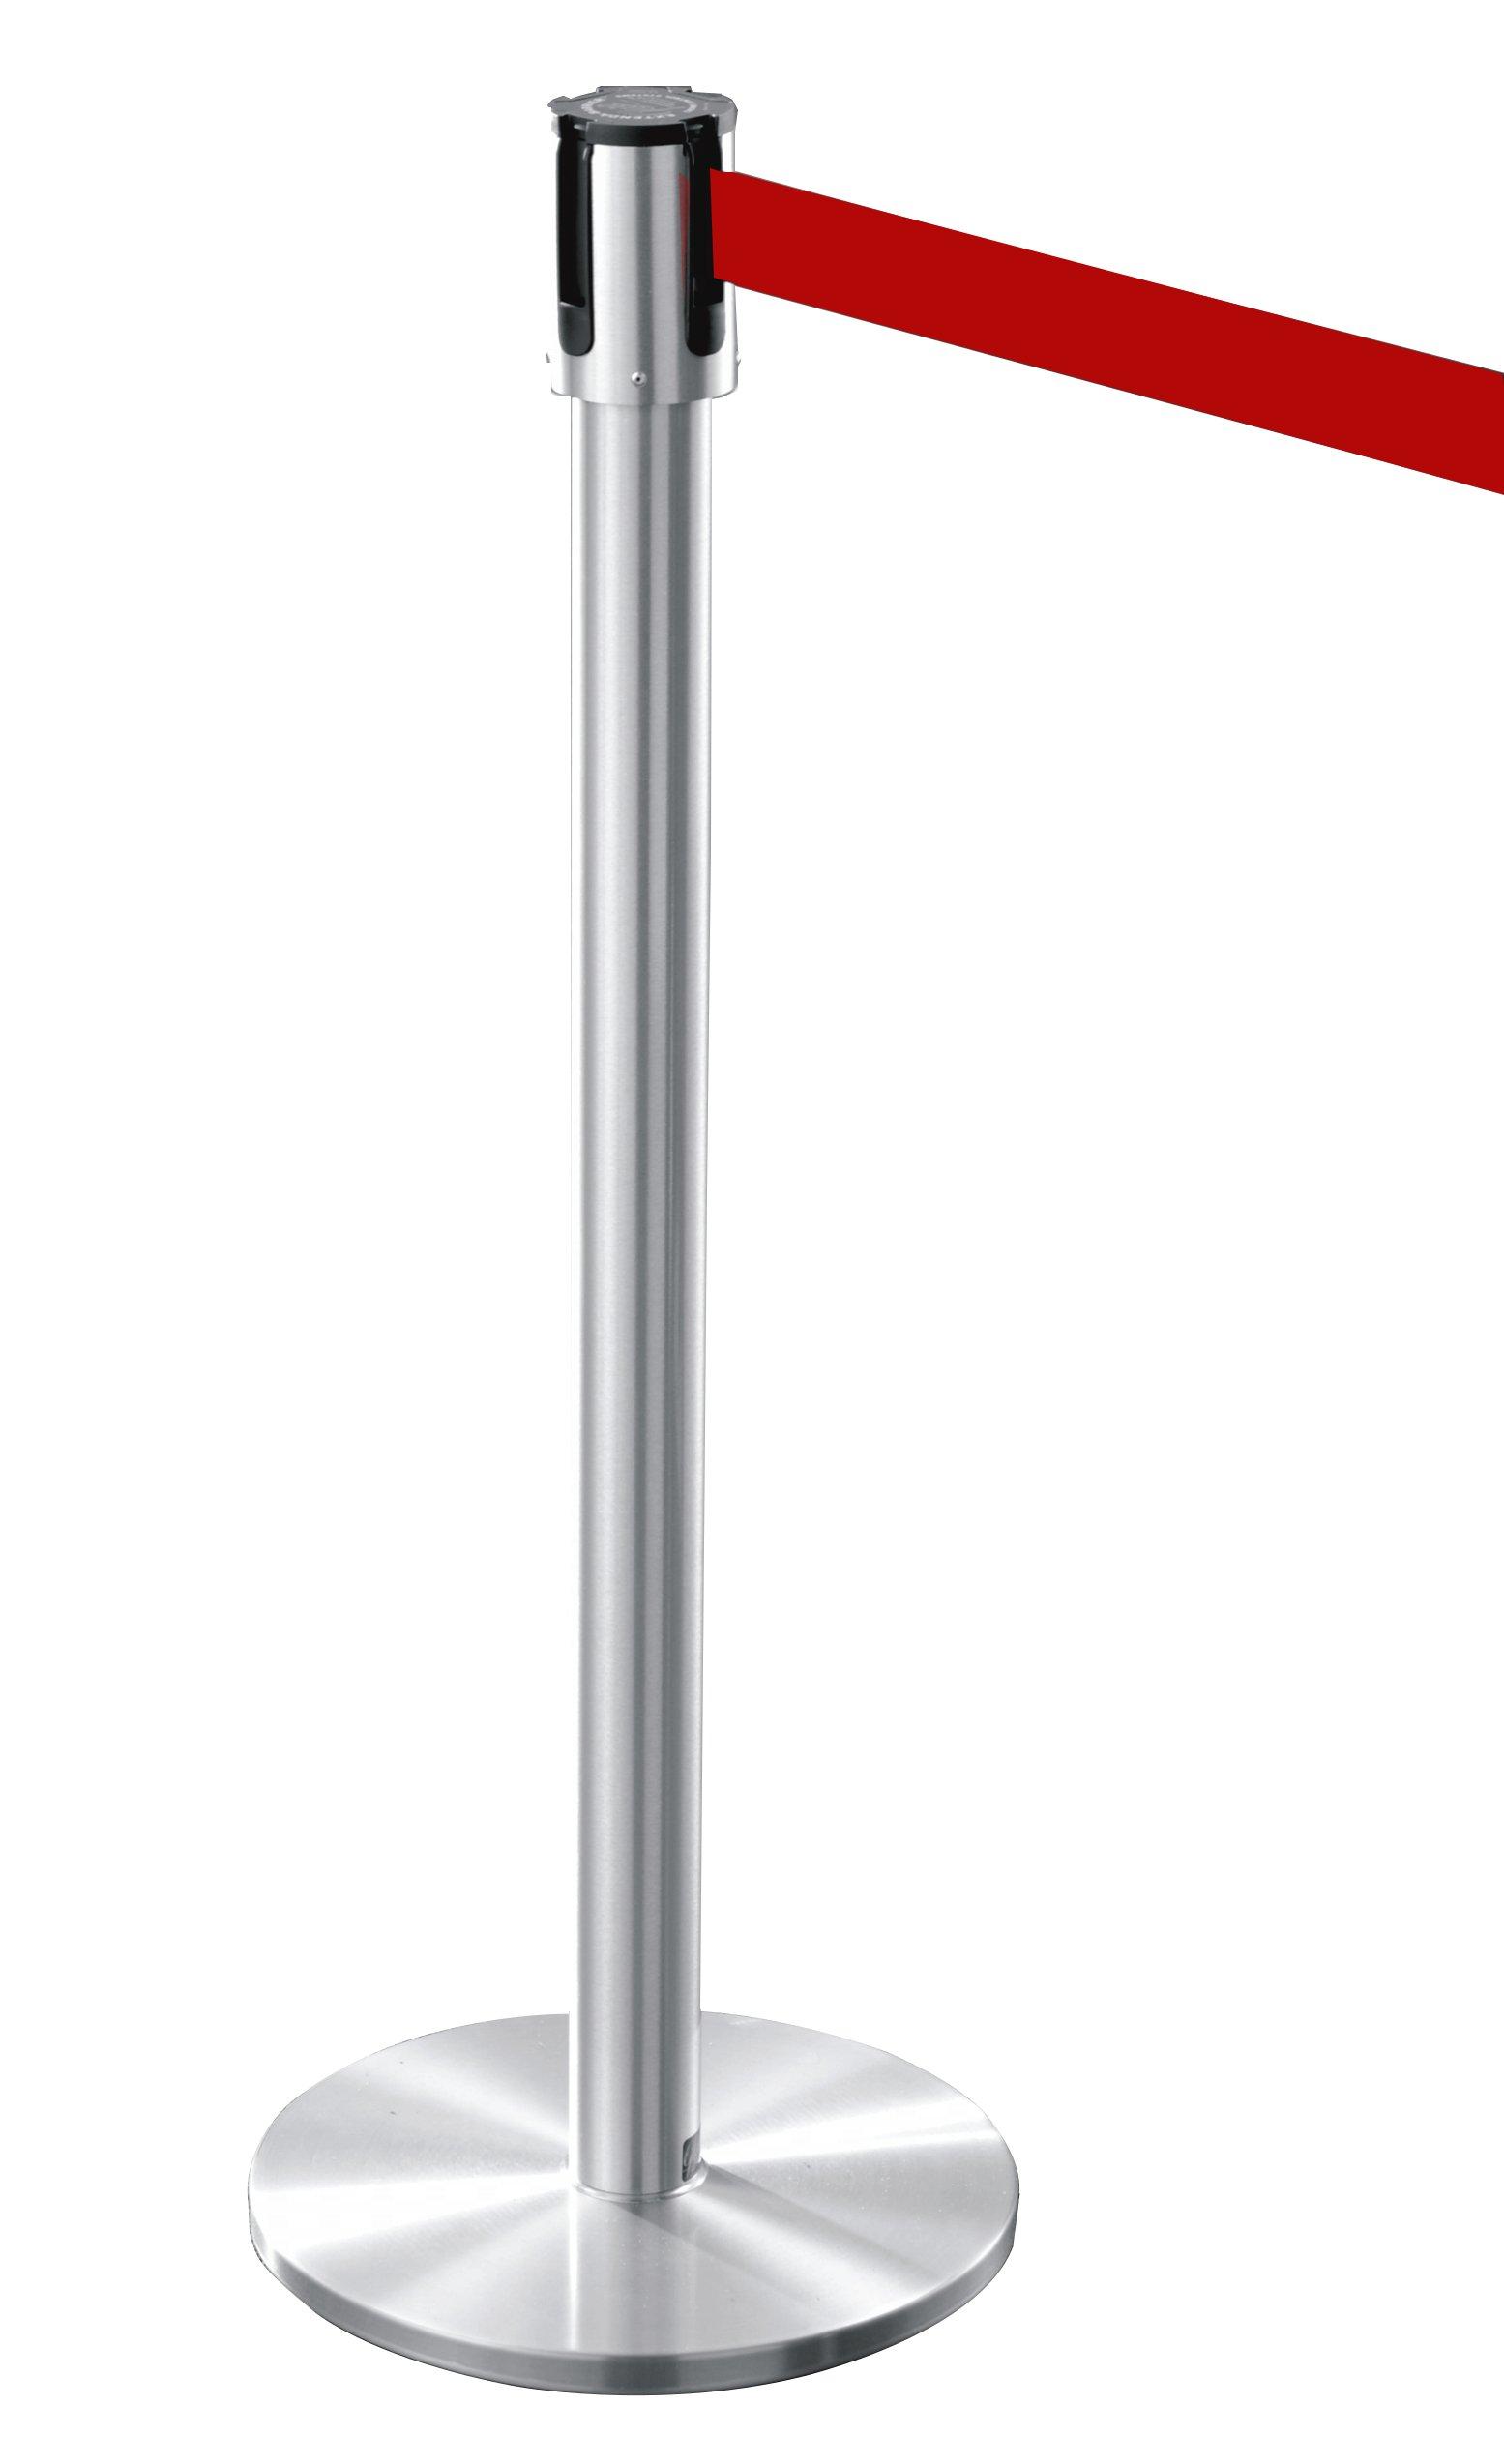 Glaro 152SA-RD 13' Retractable Belt Crowd Control Post - Satin Aluminum finish - Red Belt